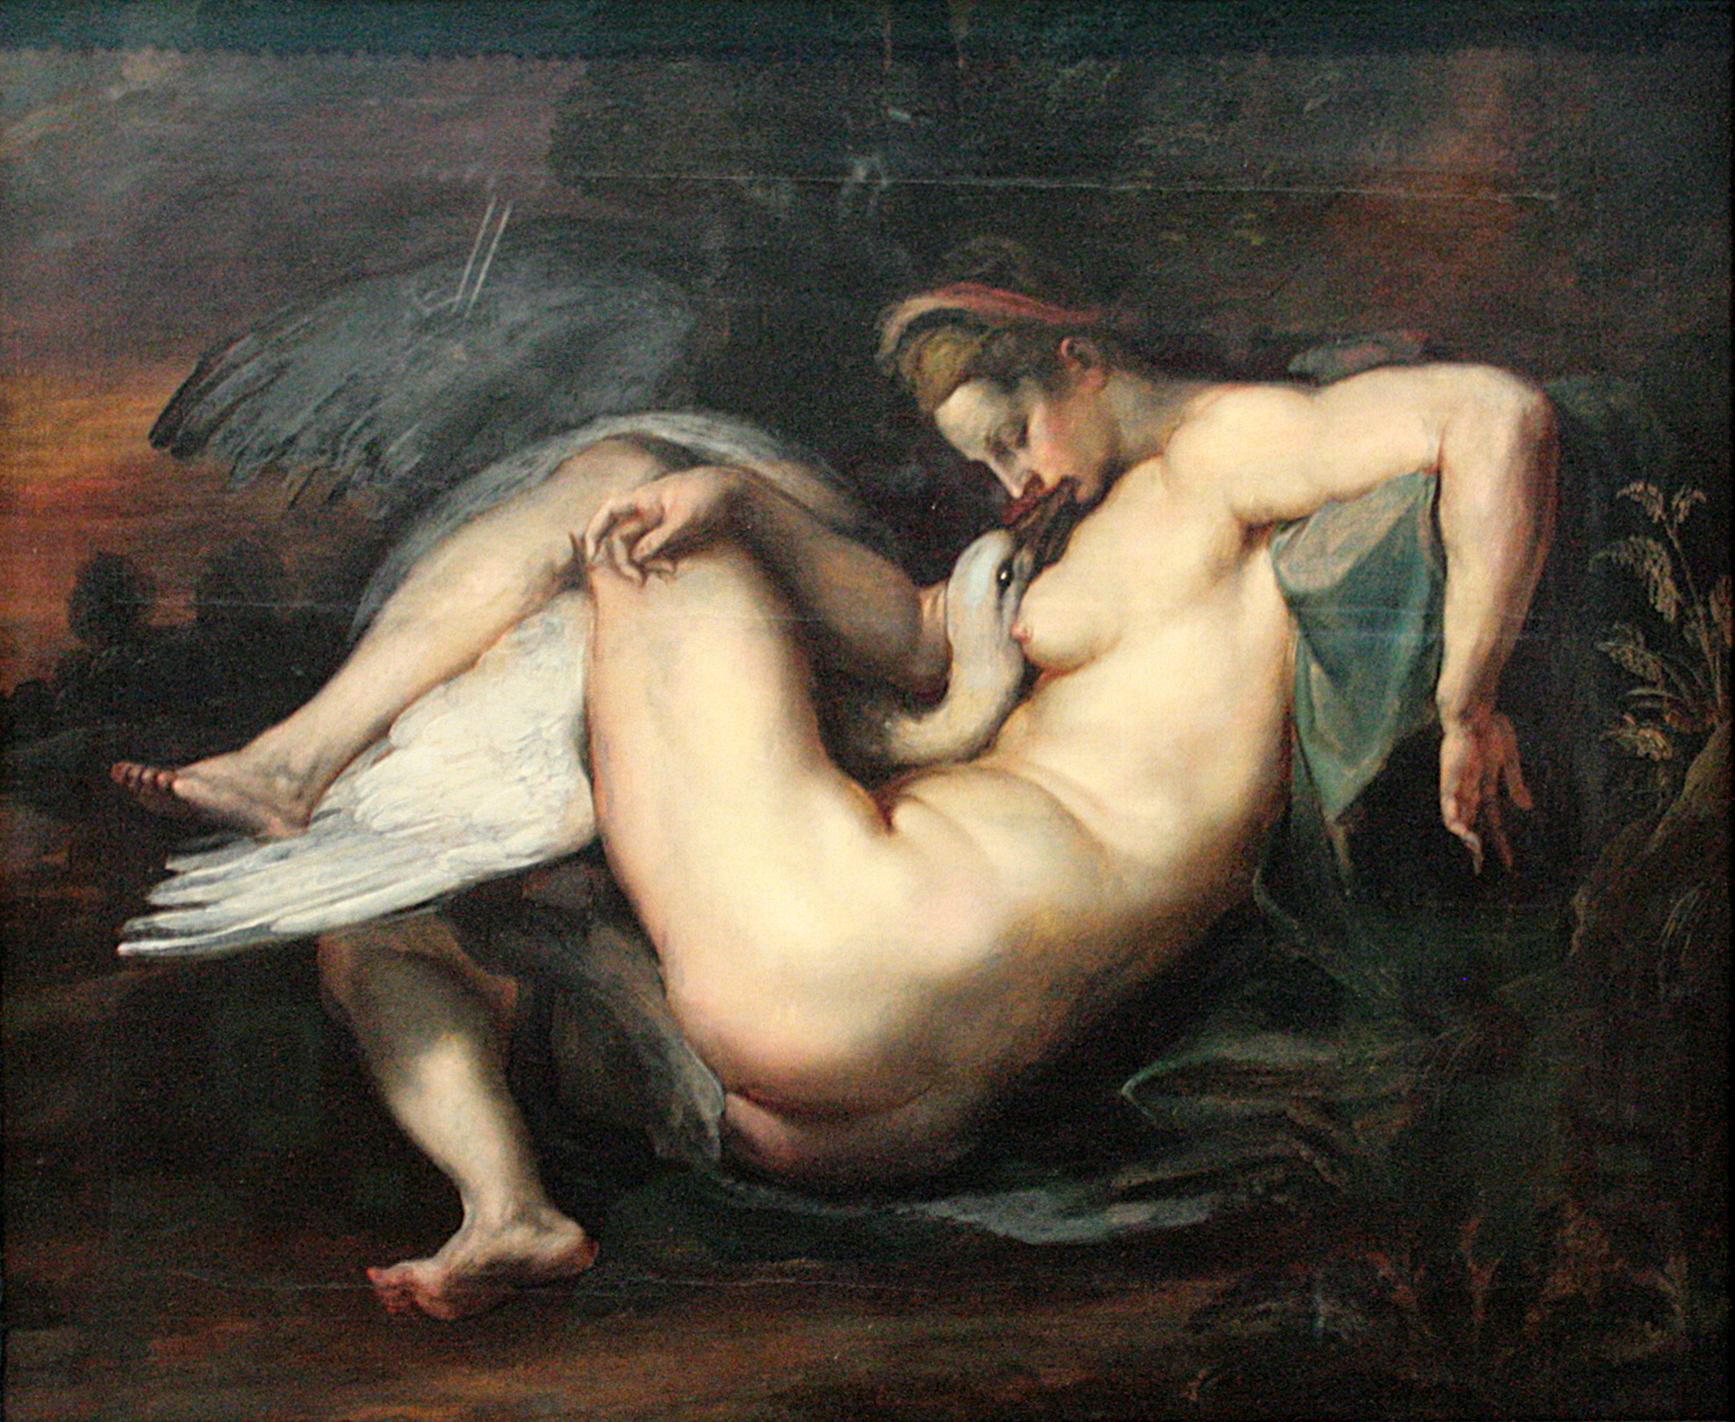 Leda and the Swan (Rubens) - Wikipedia